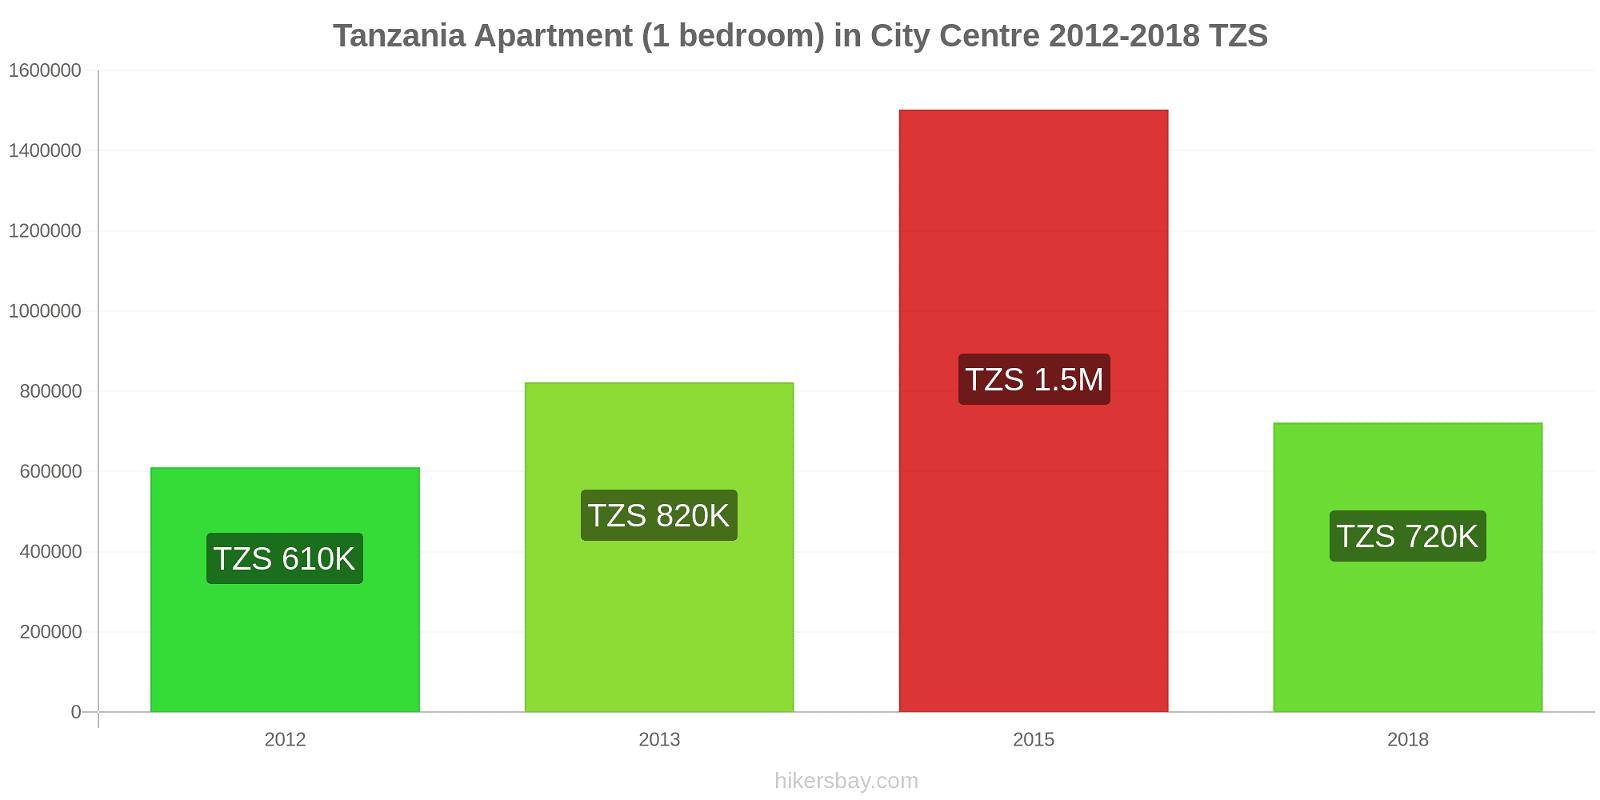 Tanzania price changes Apartment (1 bedroom) in City Centre hikersbay.com